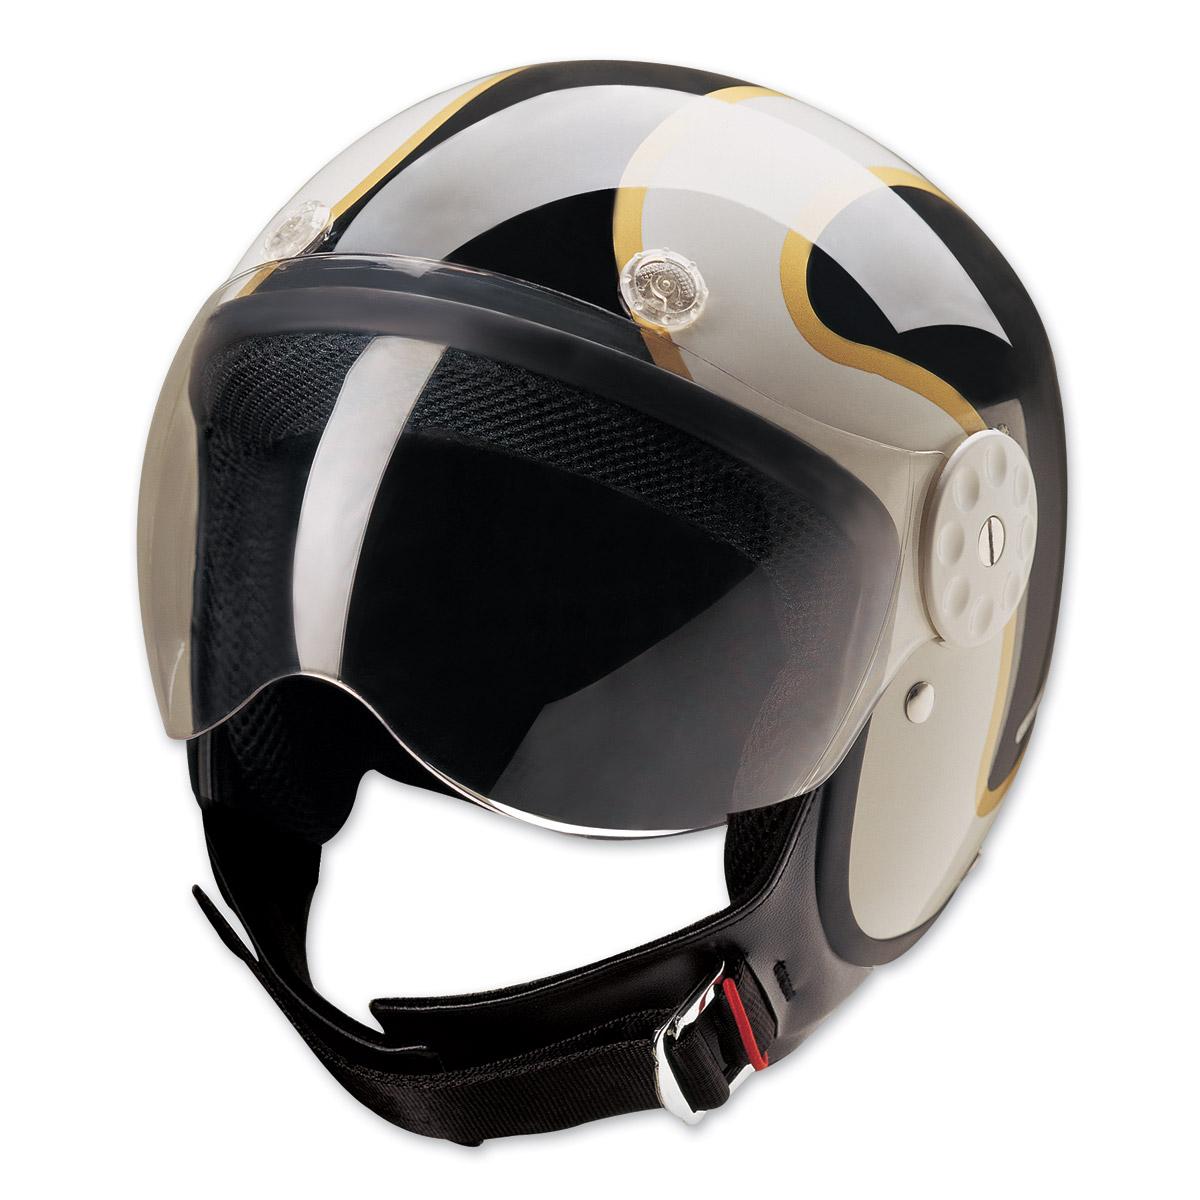 HCI-15 Stripe Black and Gold Open Face Helmet